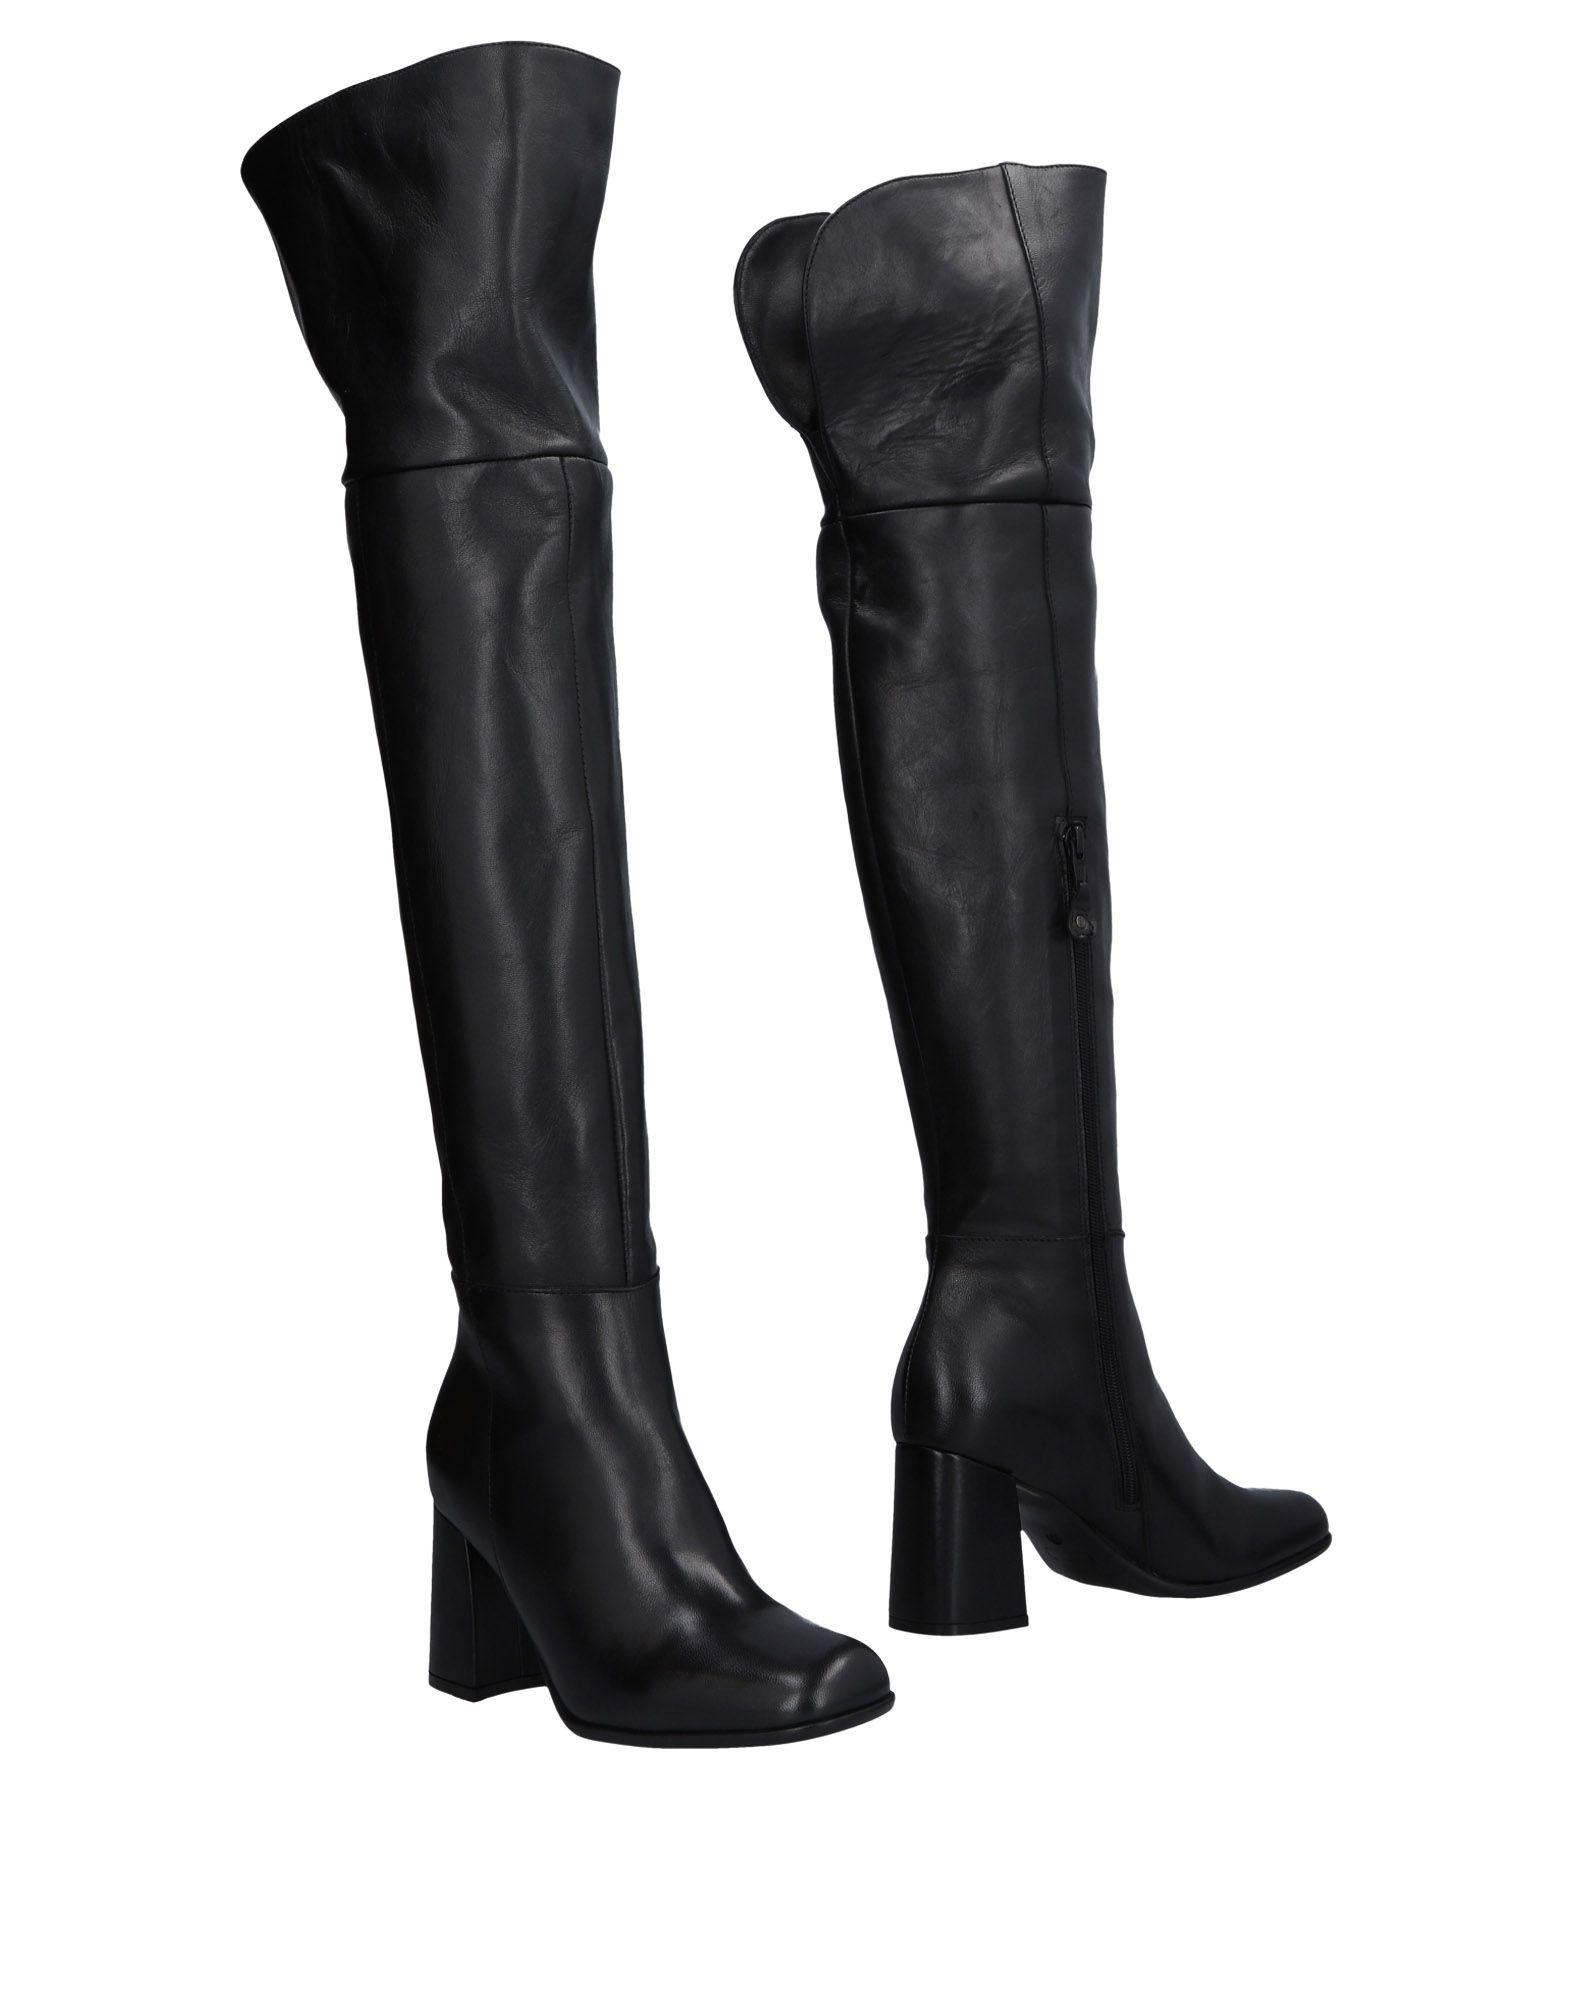 Moda Stivali Formentini Donna - 11479126BP